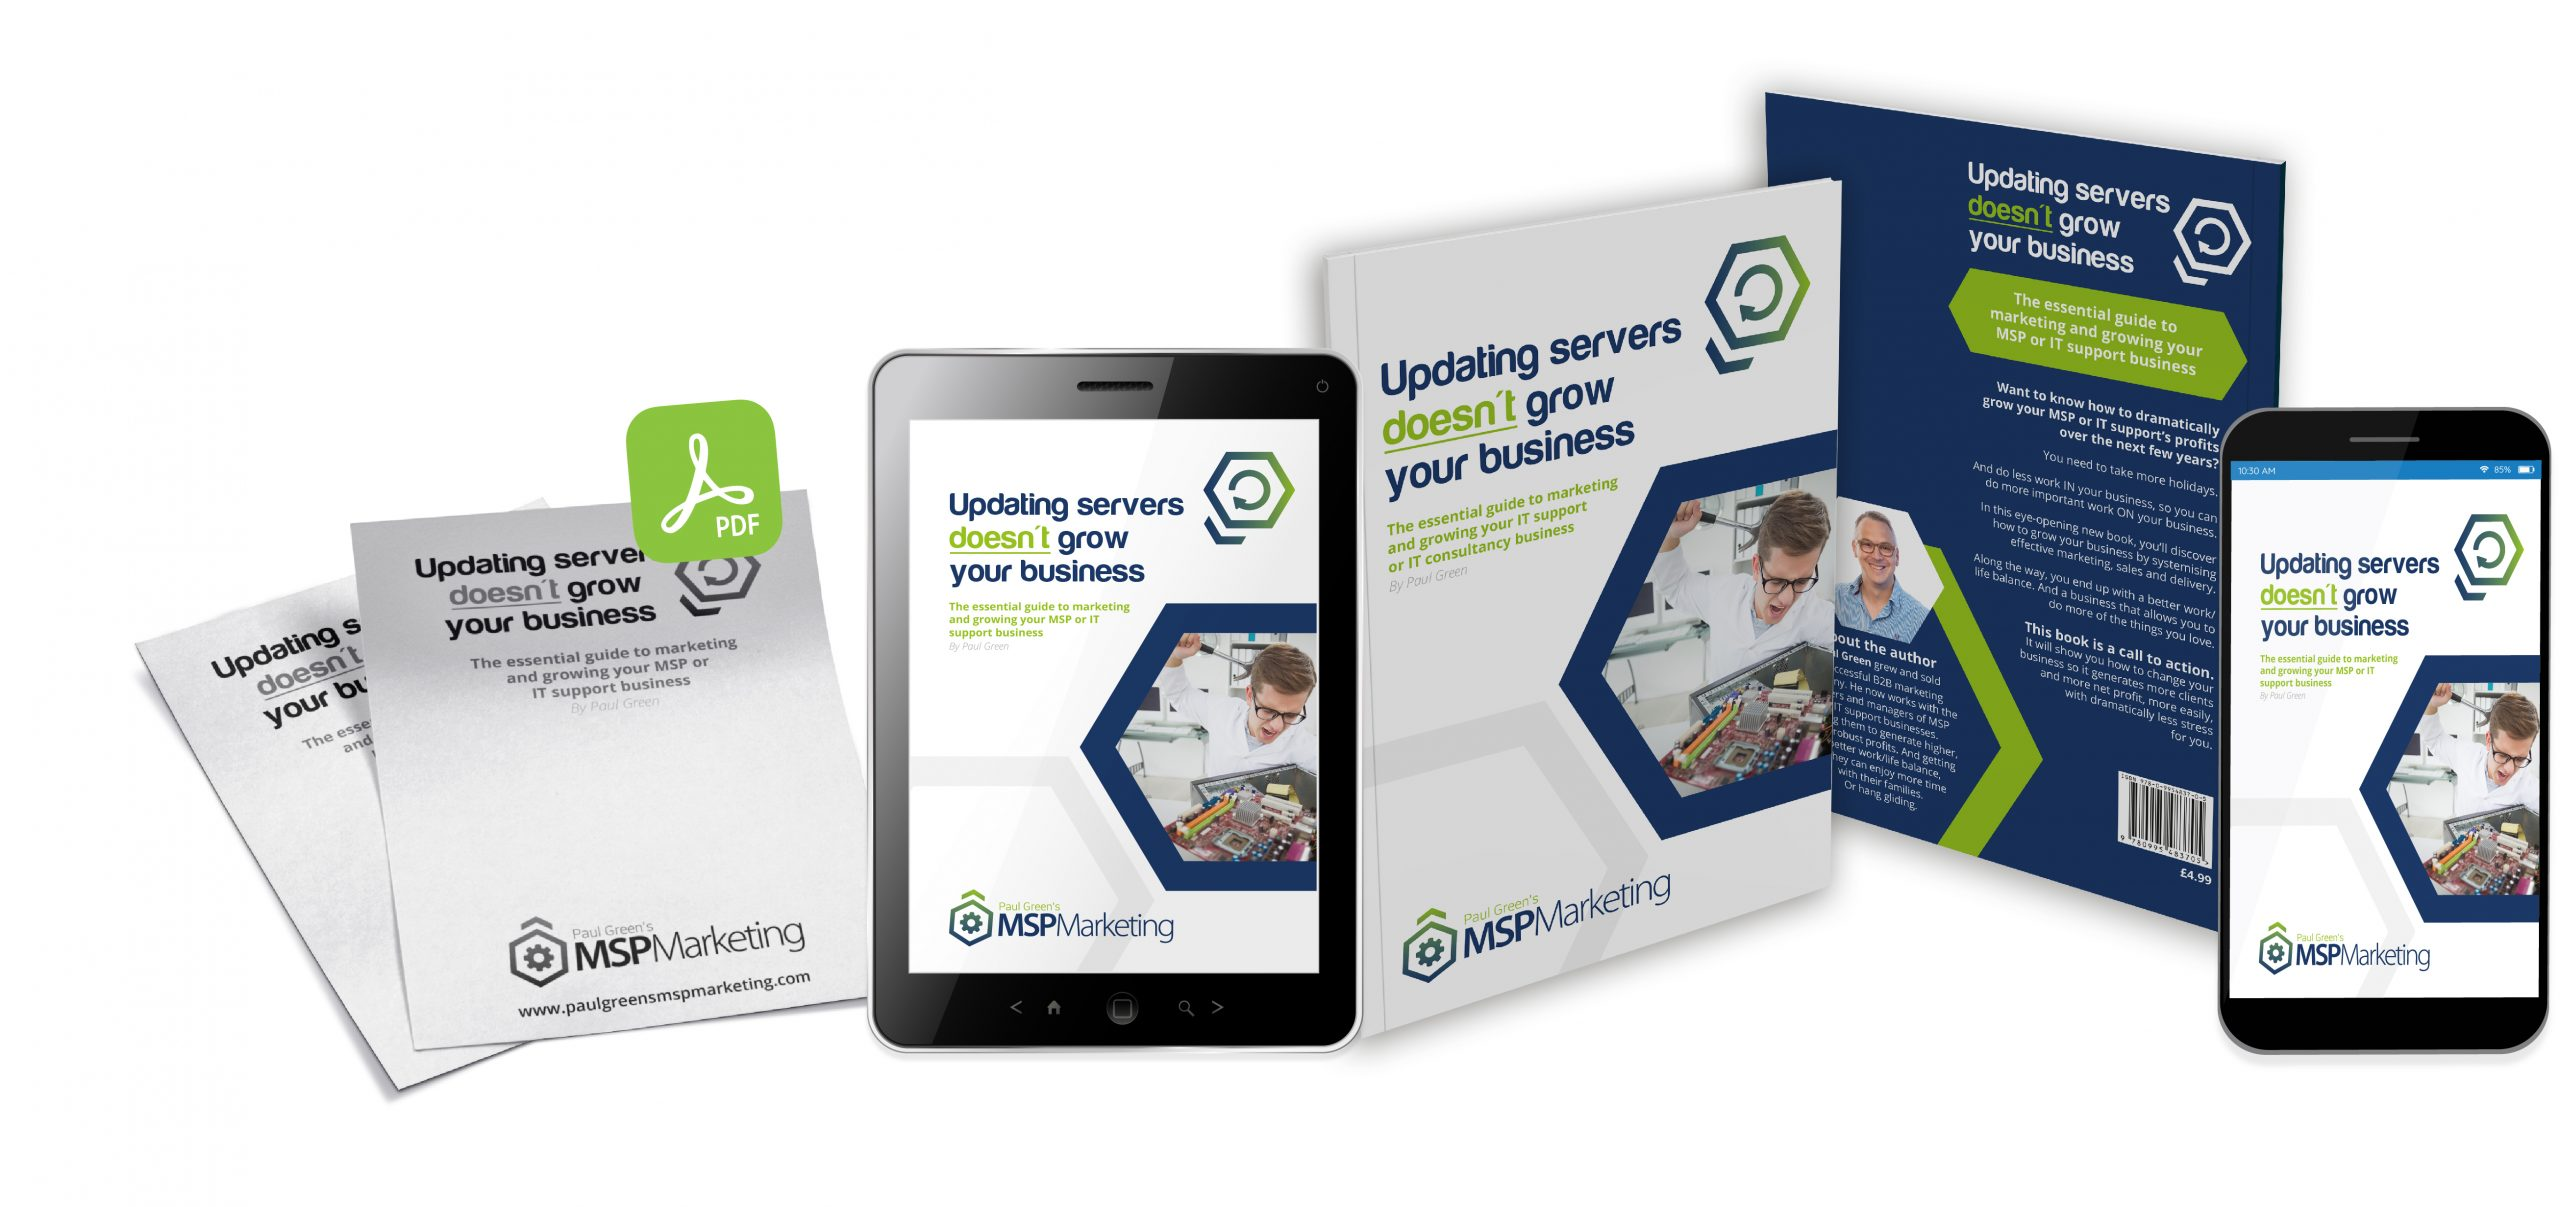 Paul Green's MSP Marketing   Marketing Materials available